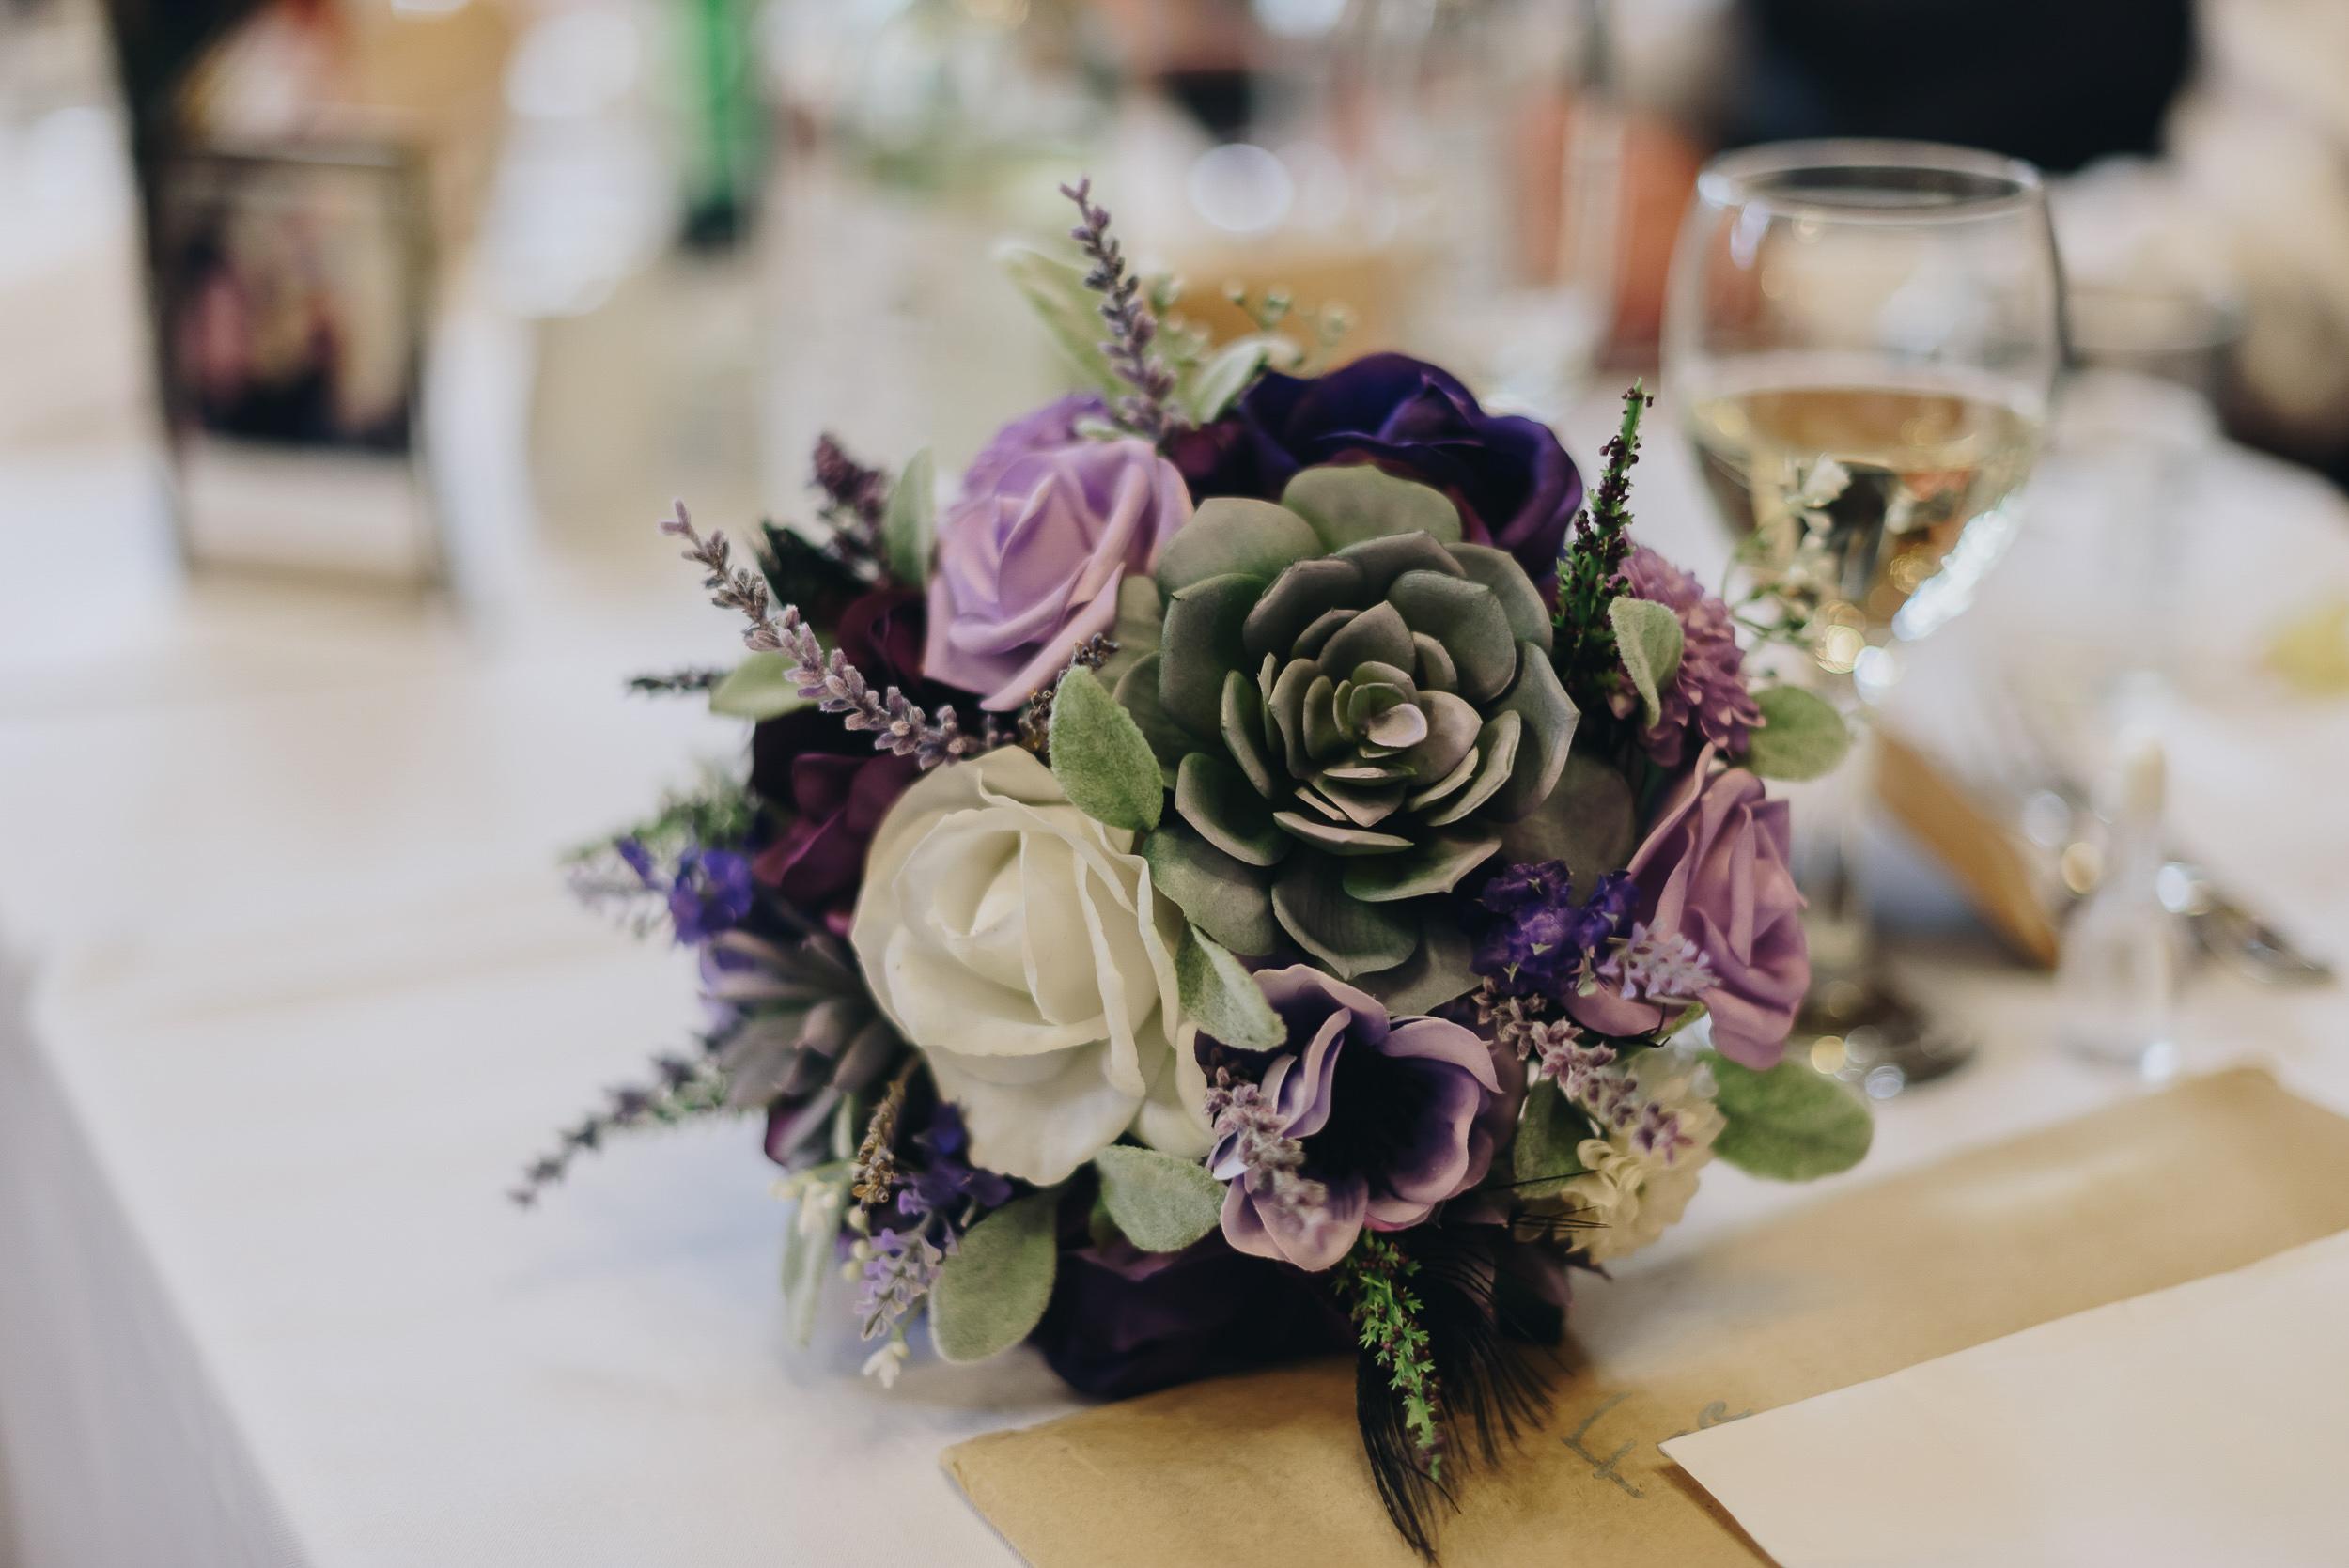 Smithills-hall-wedding-manchester-the-barlow-edgworth-hadfield-94.jpg